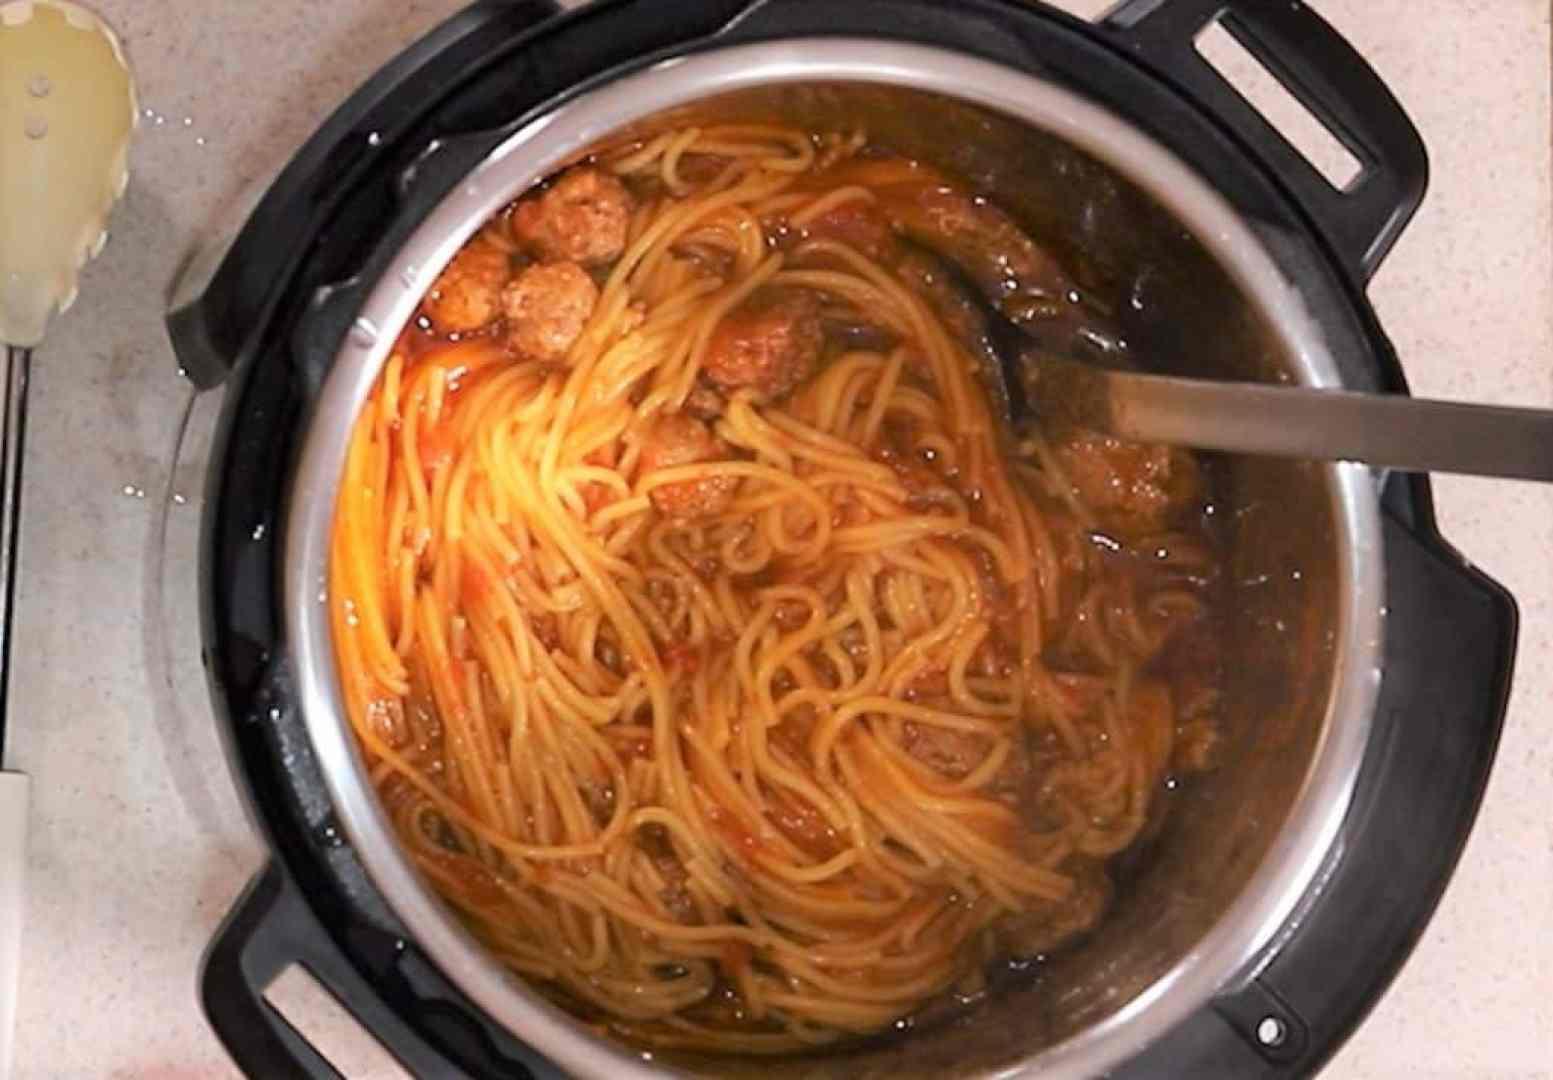 Stir Spaghetti Around to Remove Any Clumps